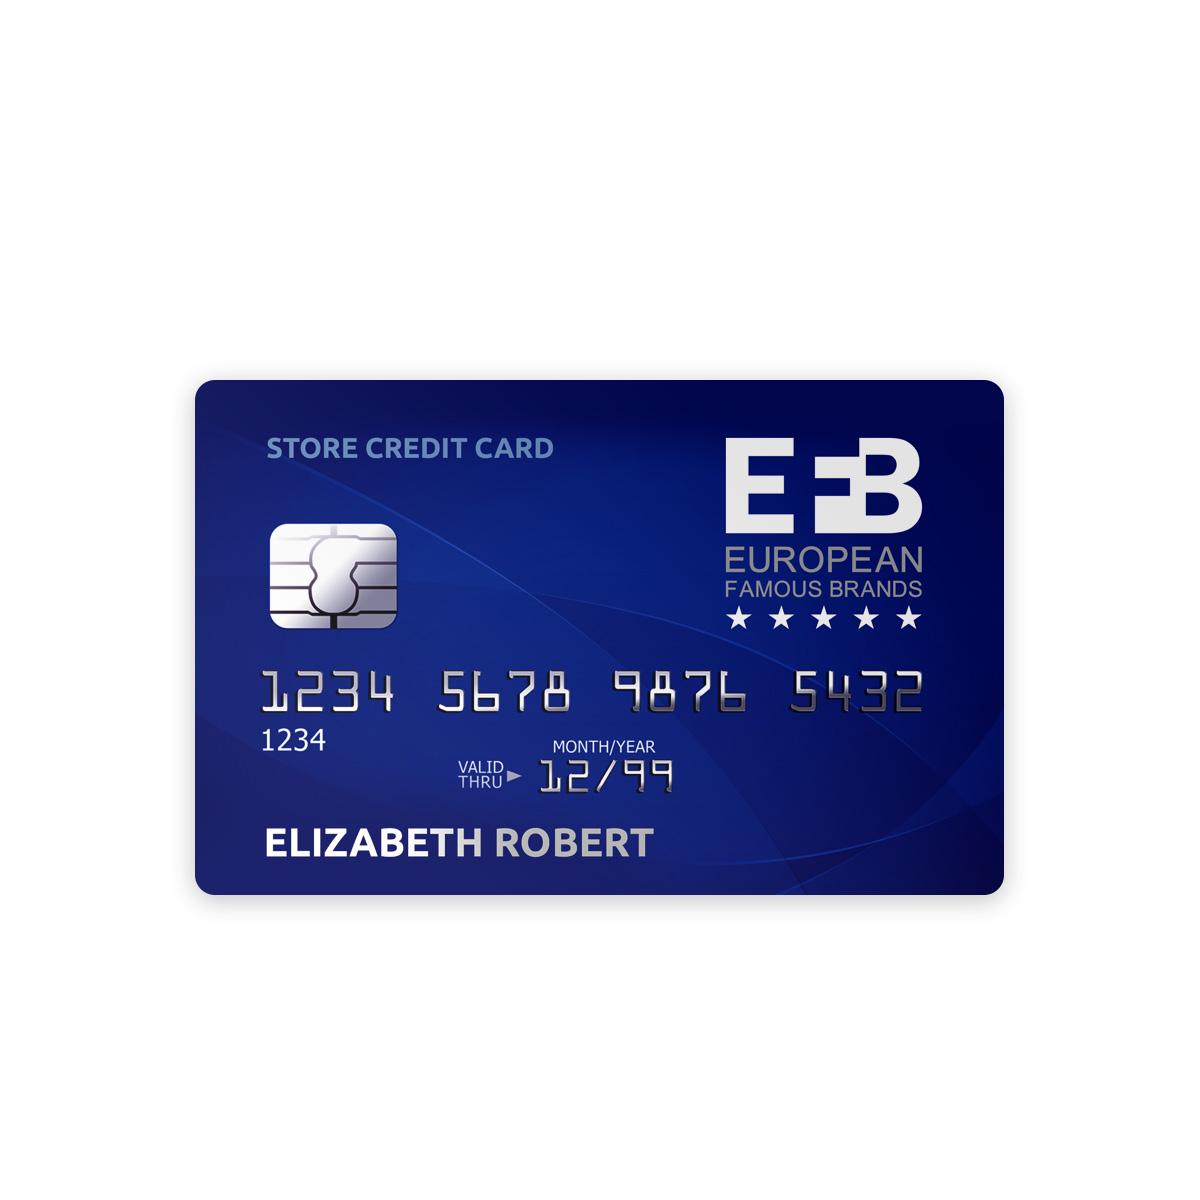 efb-european-famous-brands-tekstil-logo-4